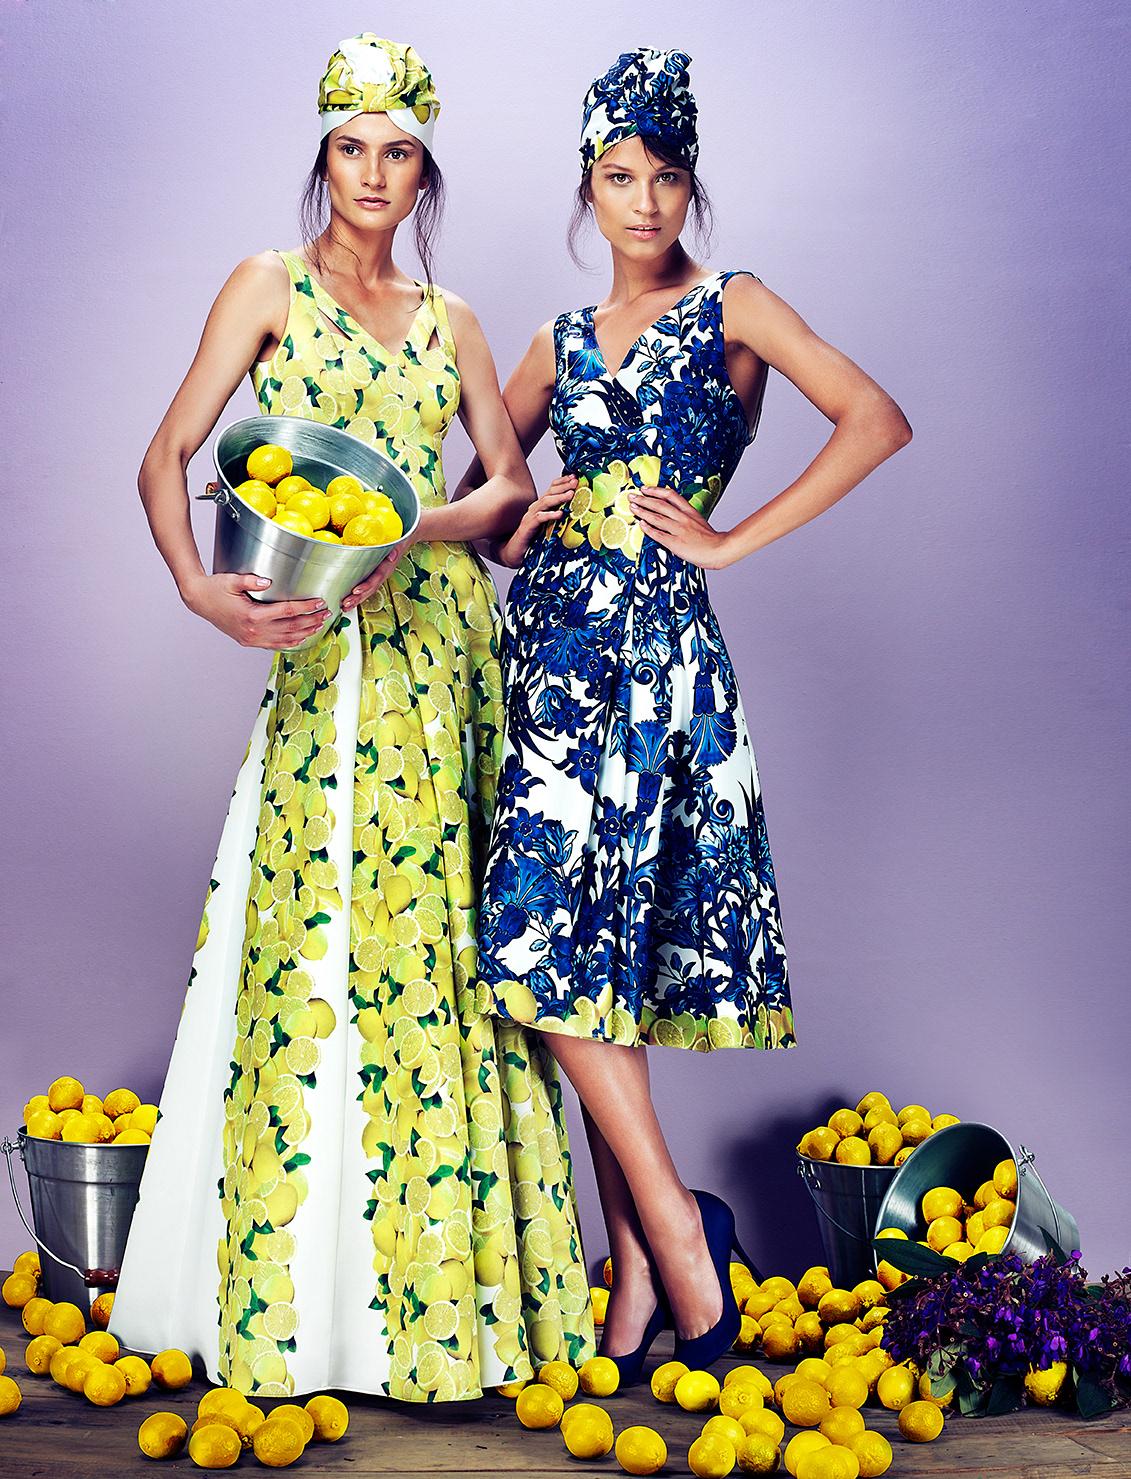 Image may contain: dress, yellow and wall